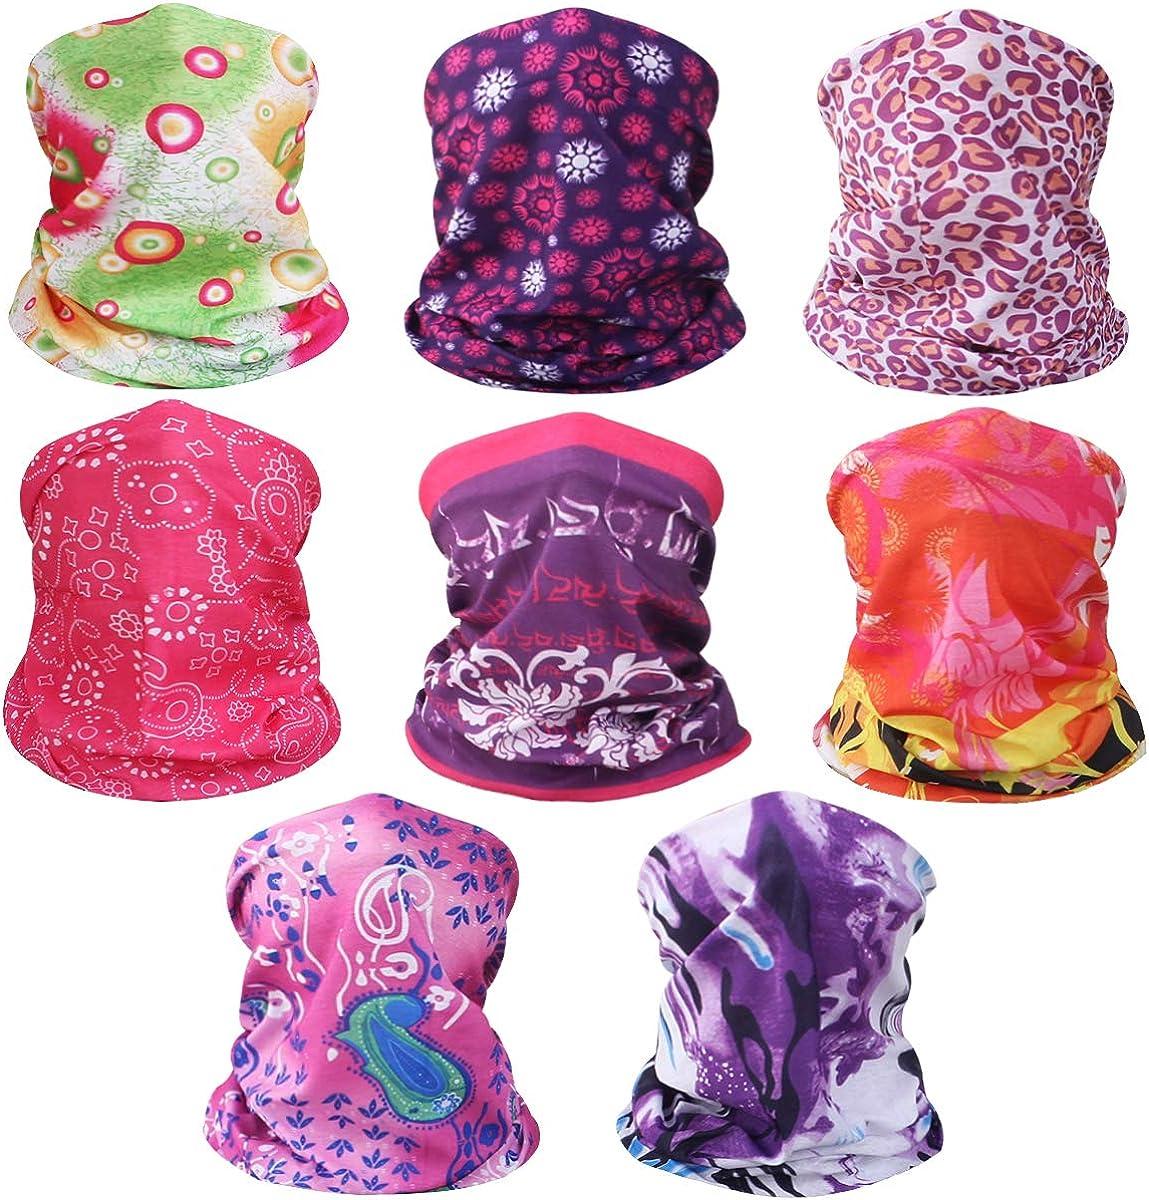 kilofly 6//8 pc Multi-purpose Seamless Headwear Bandanas Mixed Set Value Pack